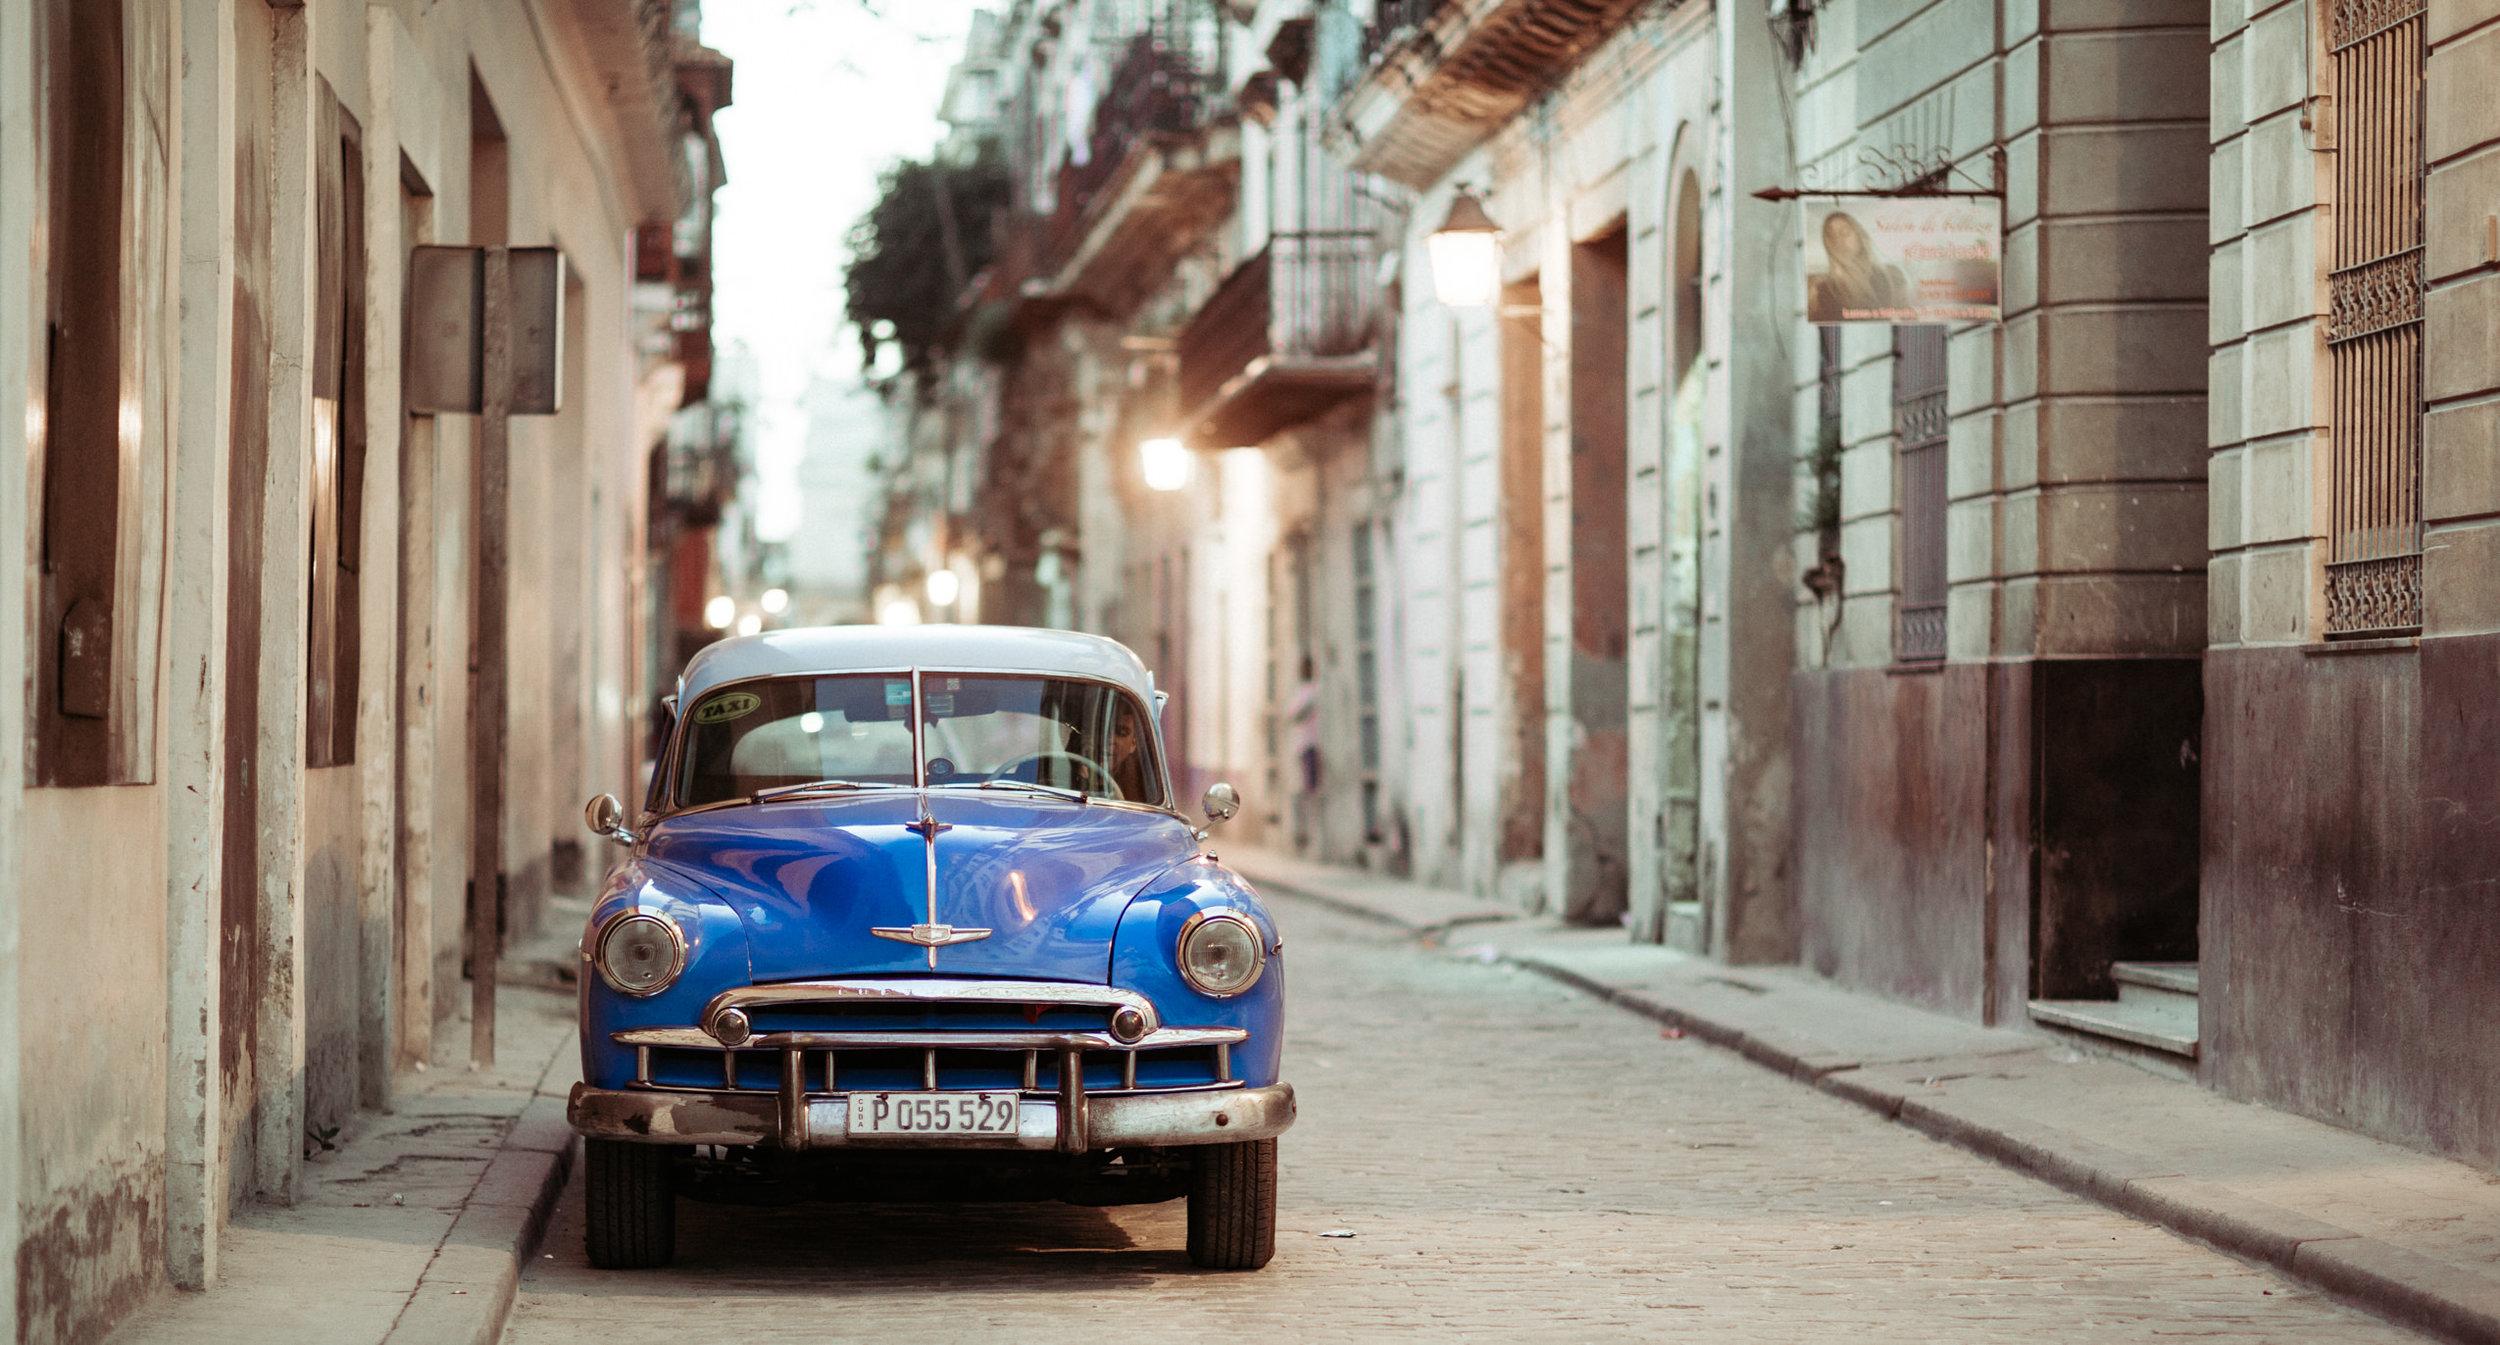 Elliott O'Donovan Photography - Havana Cuba  (7 of 12).jpg